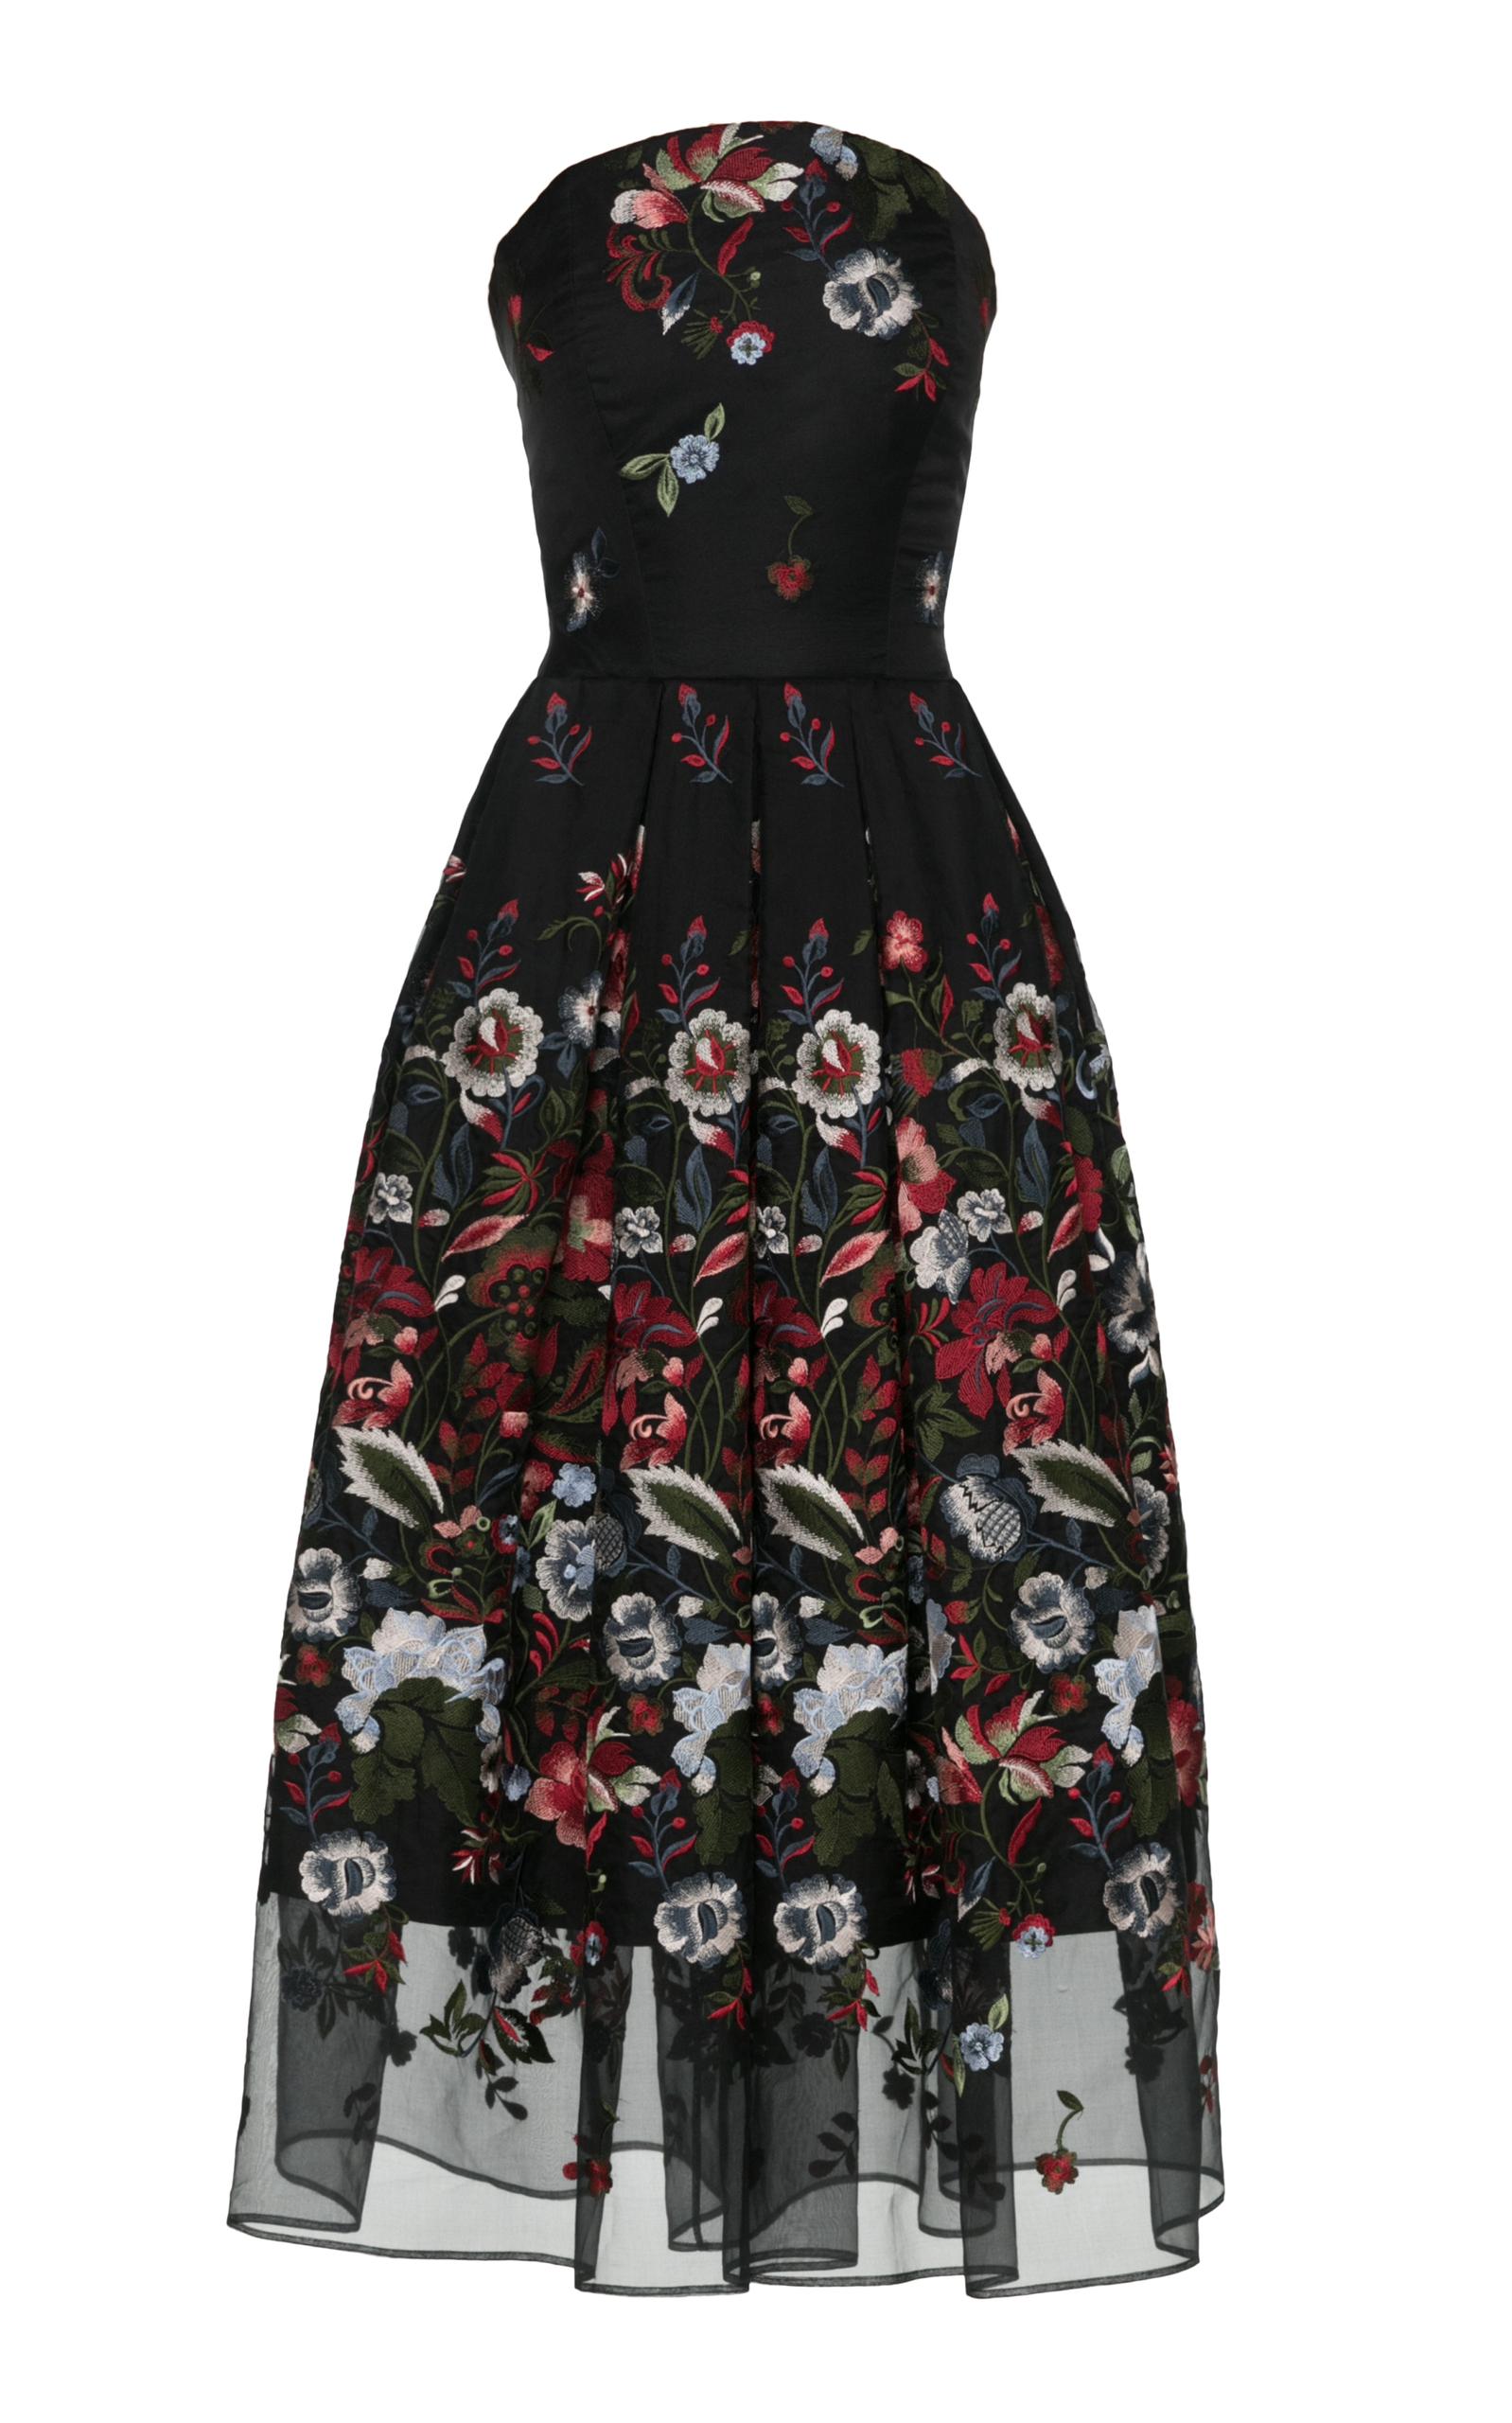 cbef6c43af17f Pirova Strapless Tea Length Dress by Lena Hoschek | Moda Operandi